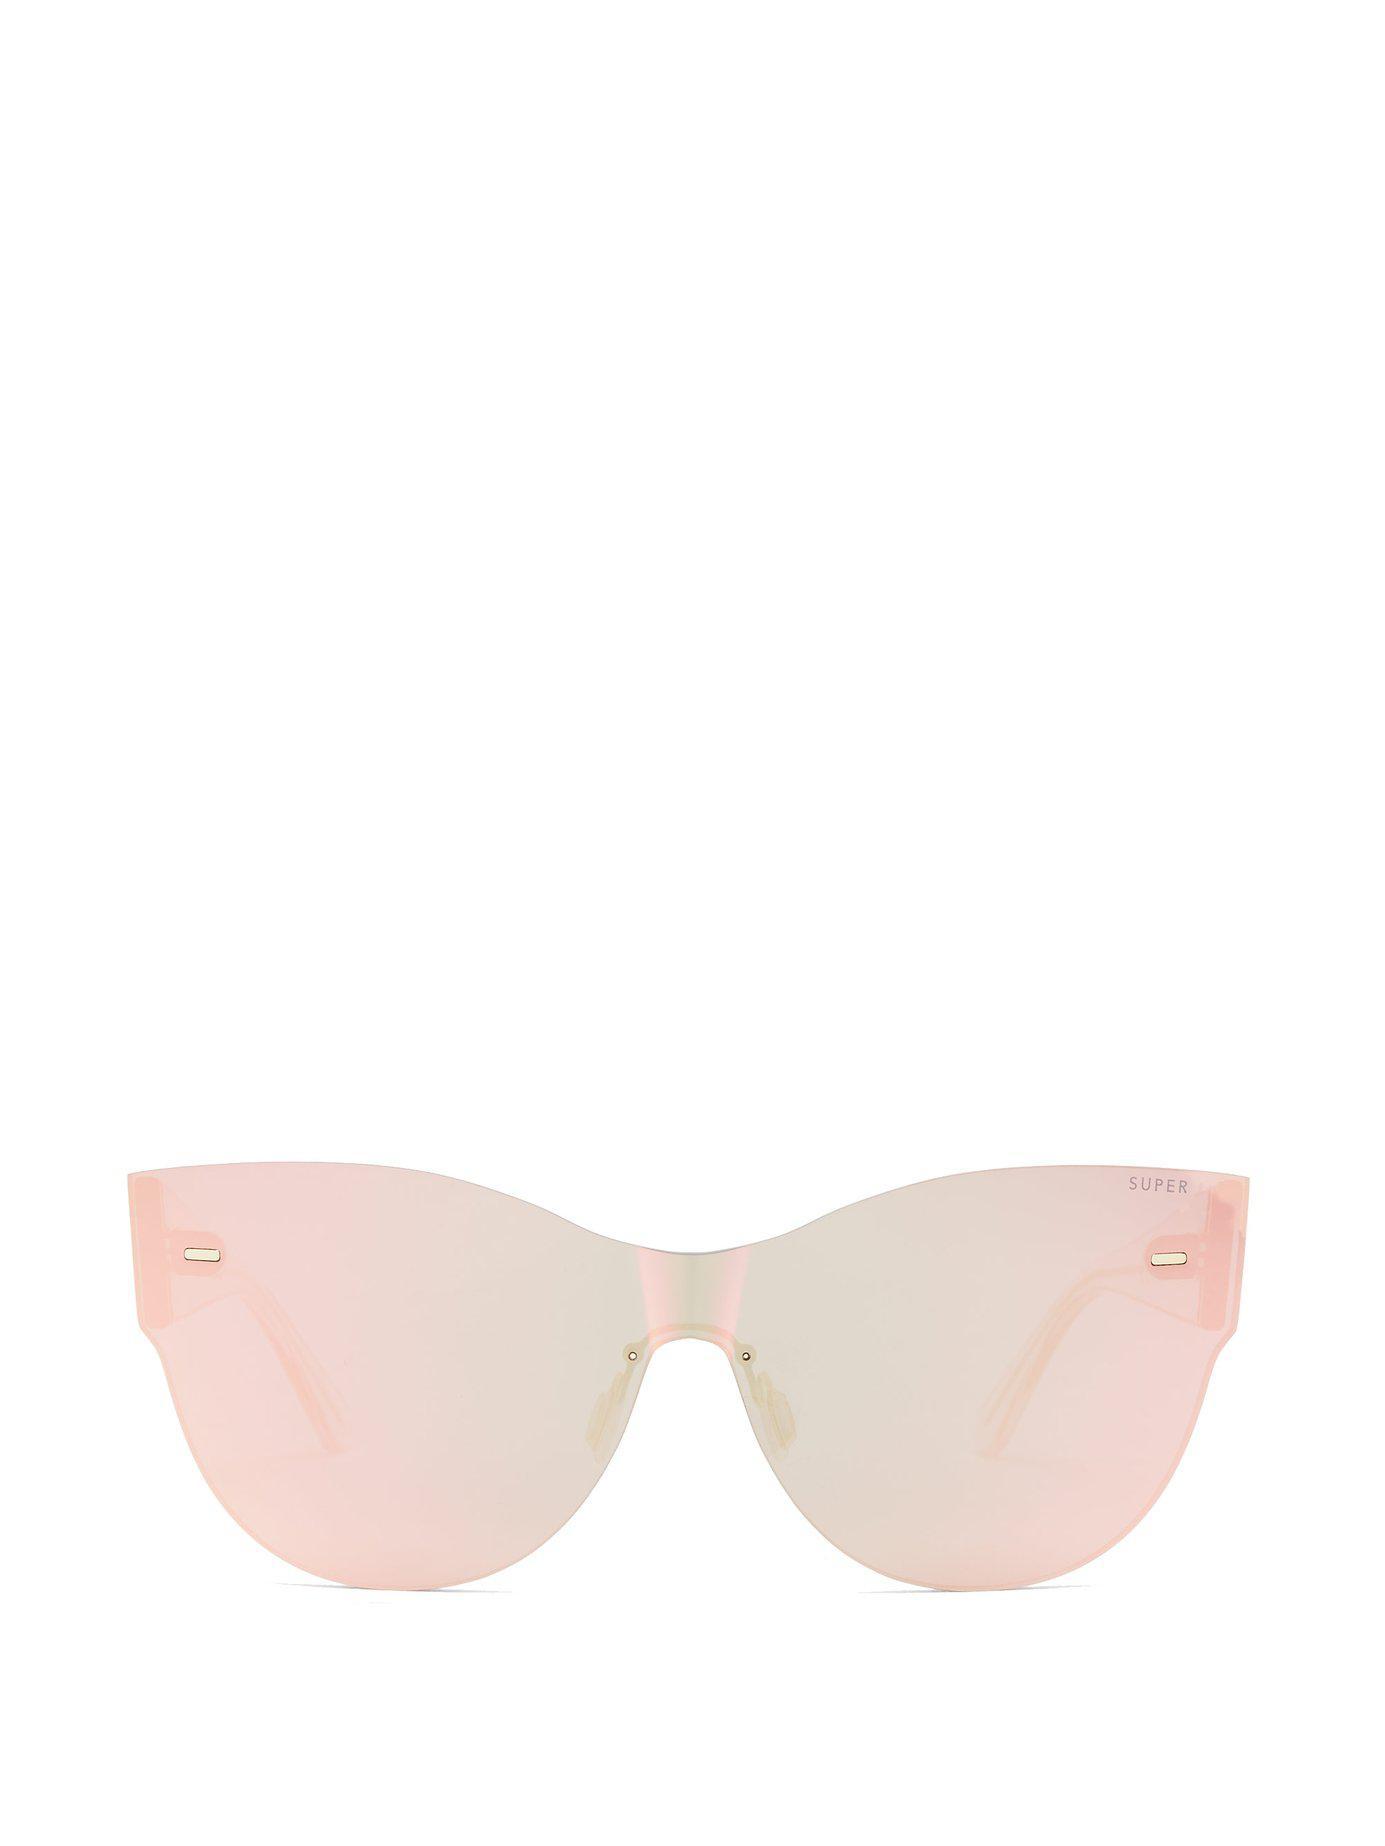 0bd6949b8322 Lyst - Retrosuperfuture Screen Kim Mirrored Cat-eye Sunglasses in Pink